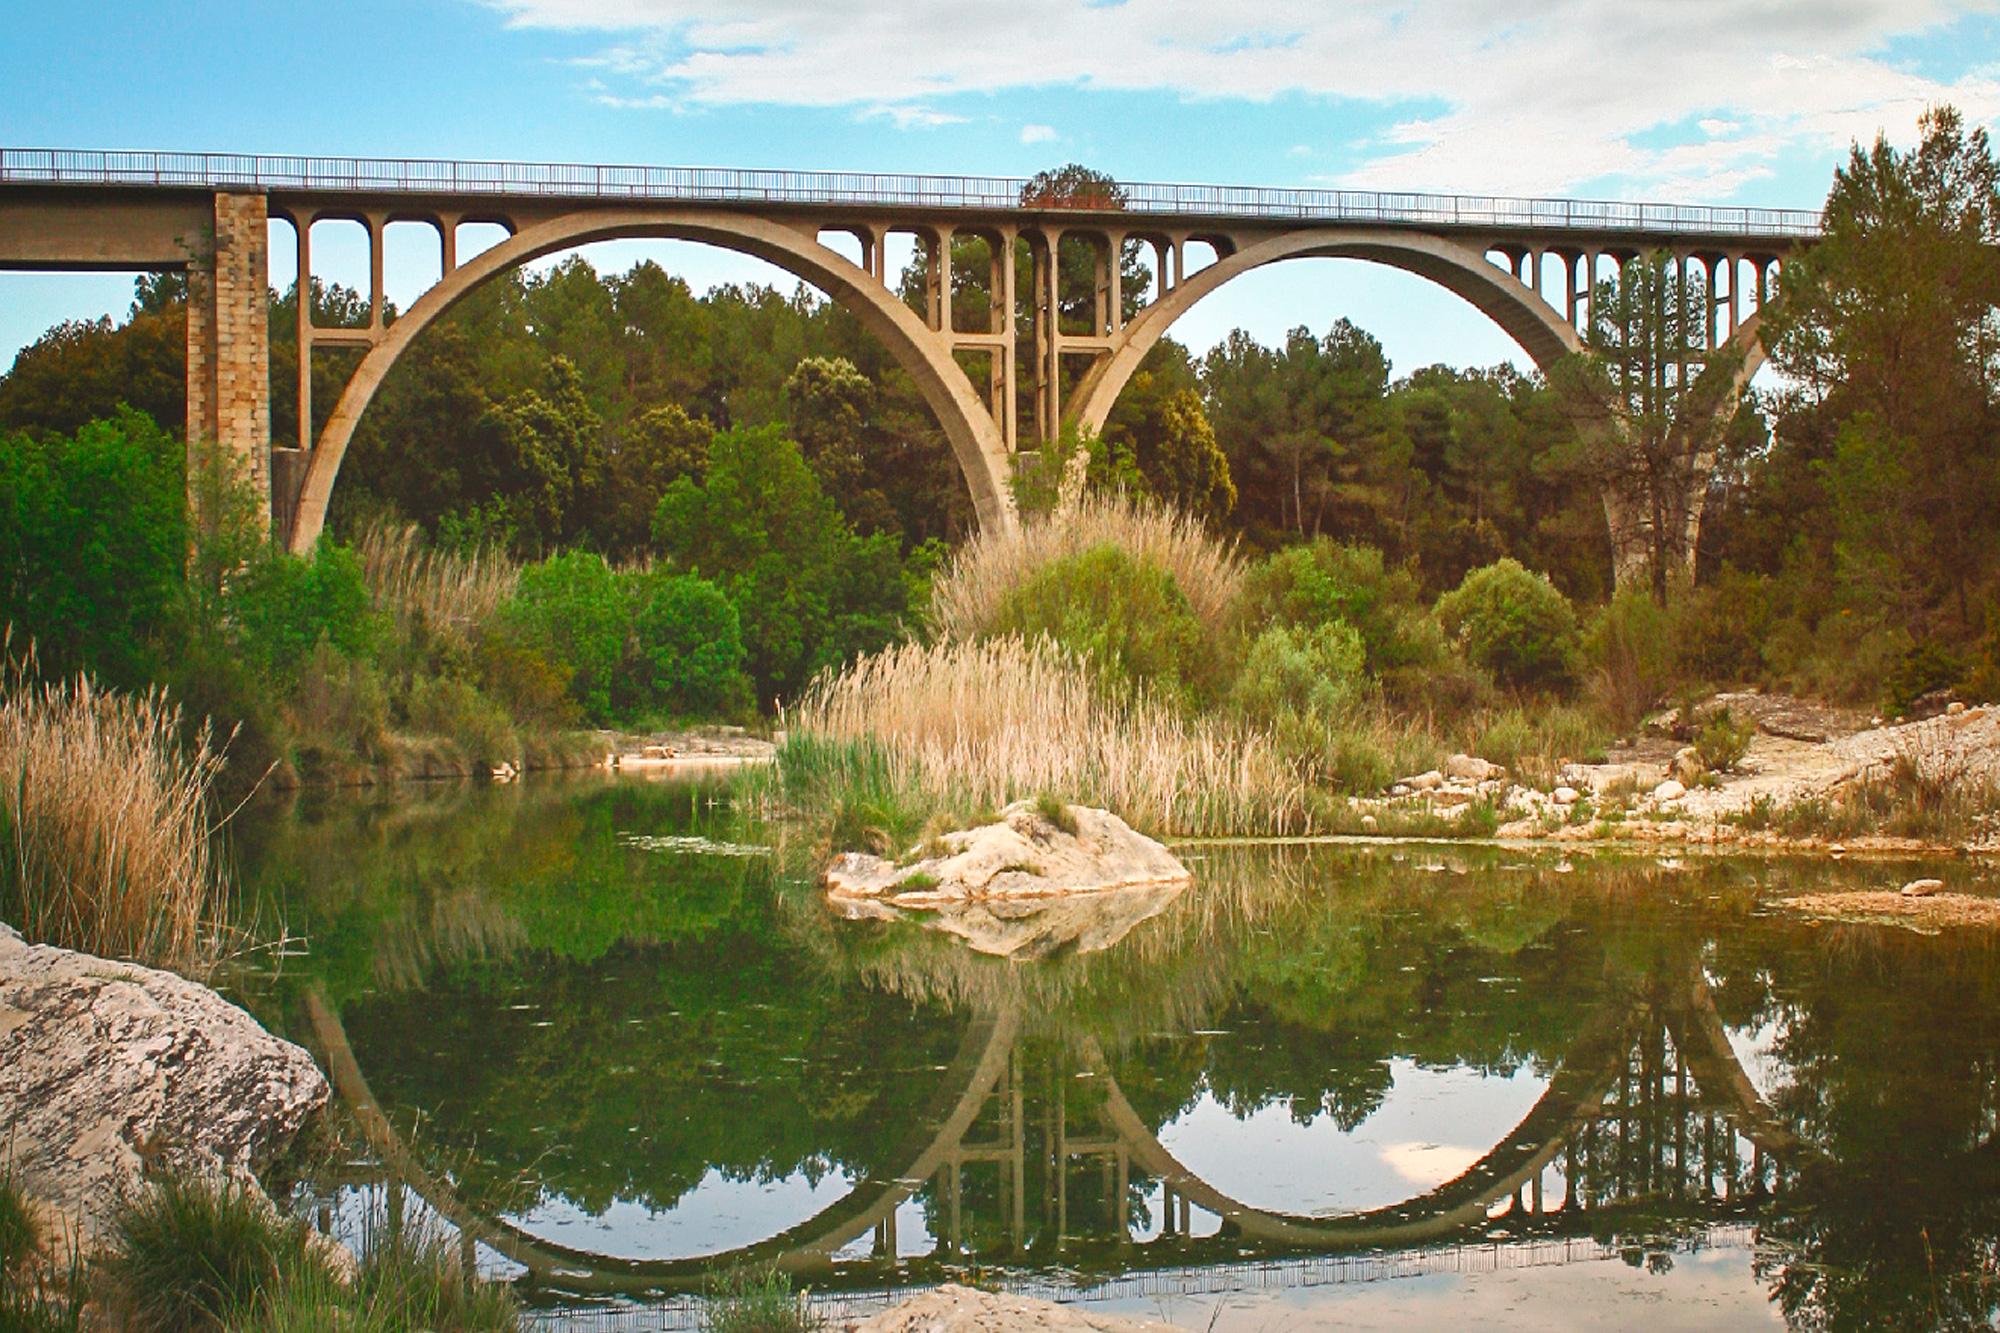 Lledo Assut Horta de Sant Joan // © Jordi Ferrer Ber